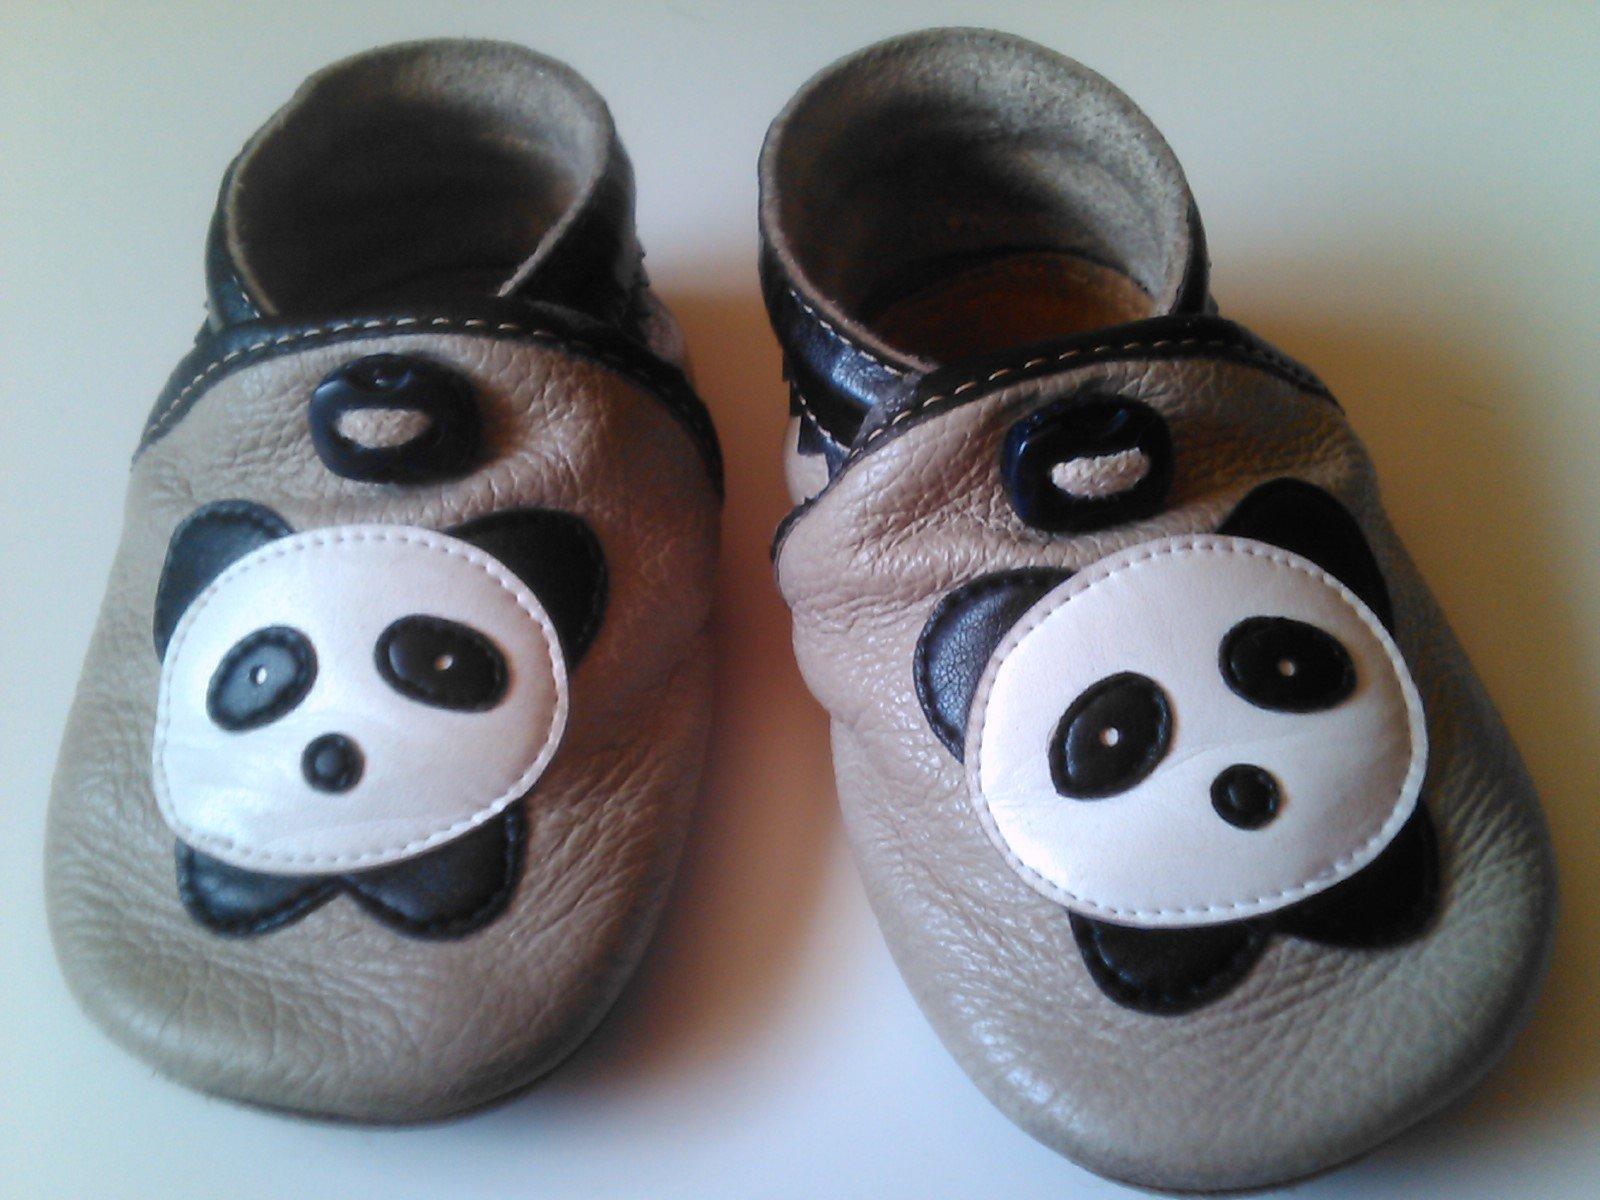 Panda 4.0 wkracza do Polski